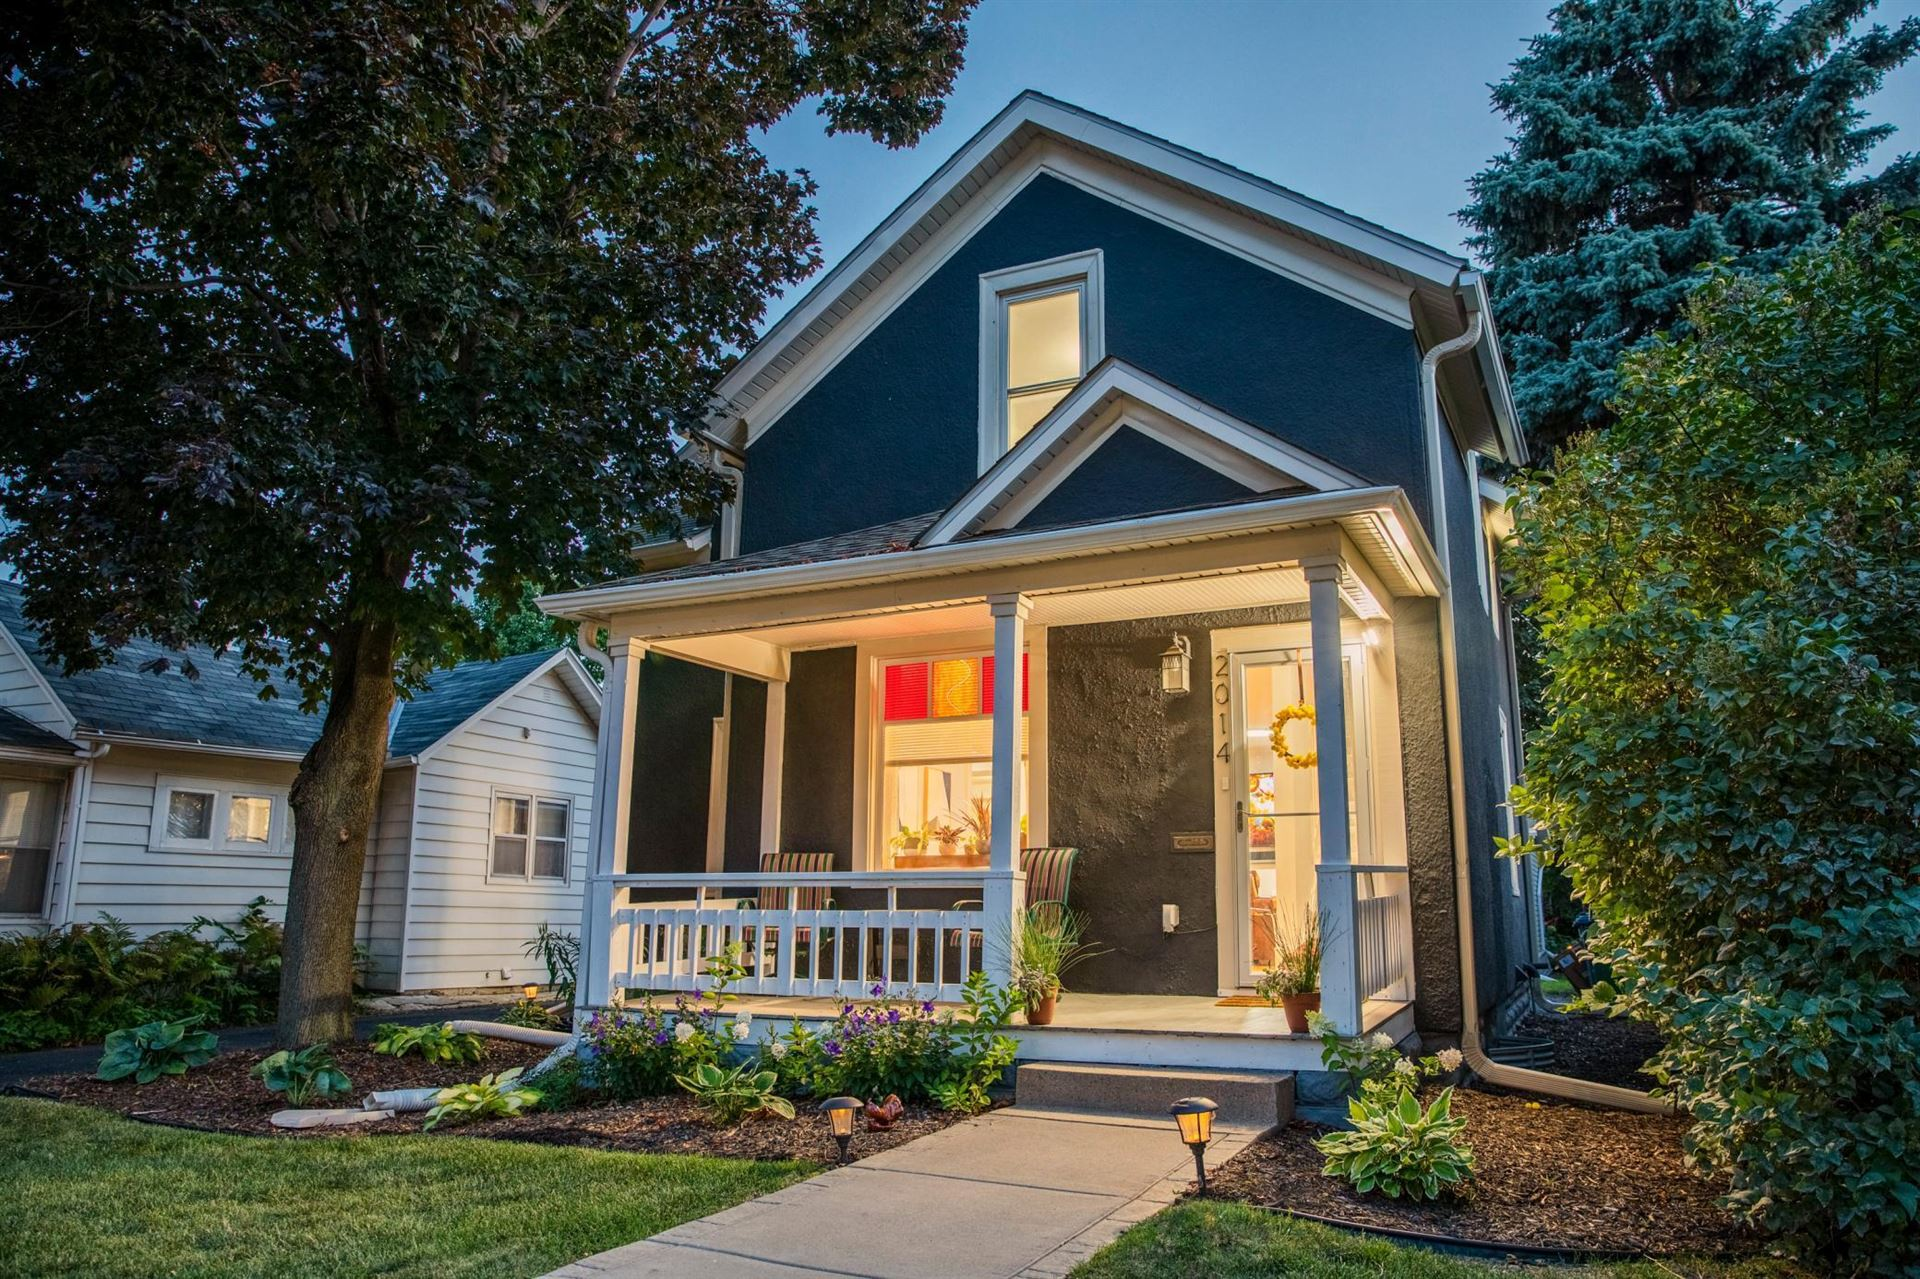 2014 Taylor Street NE, Minneapolis, MN 55418 - MLS#: 5635949